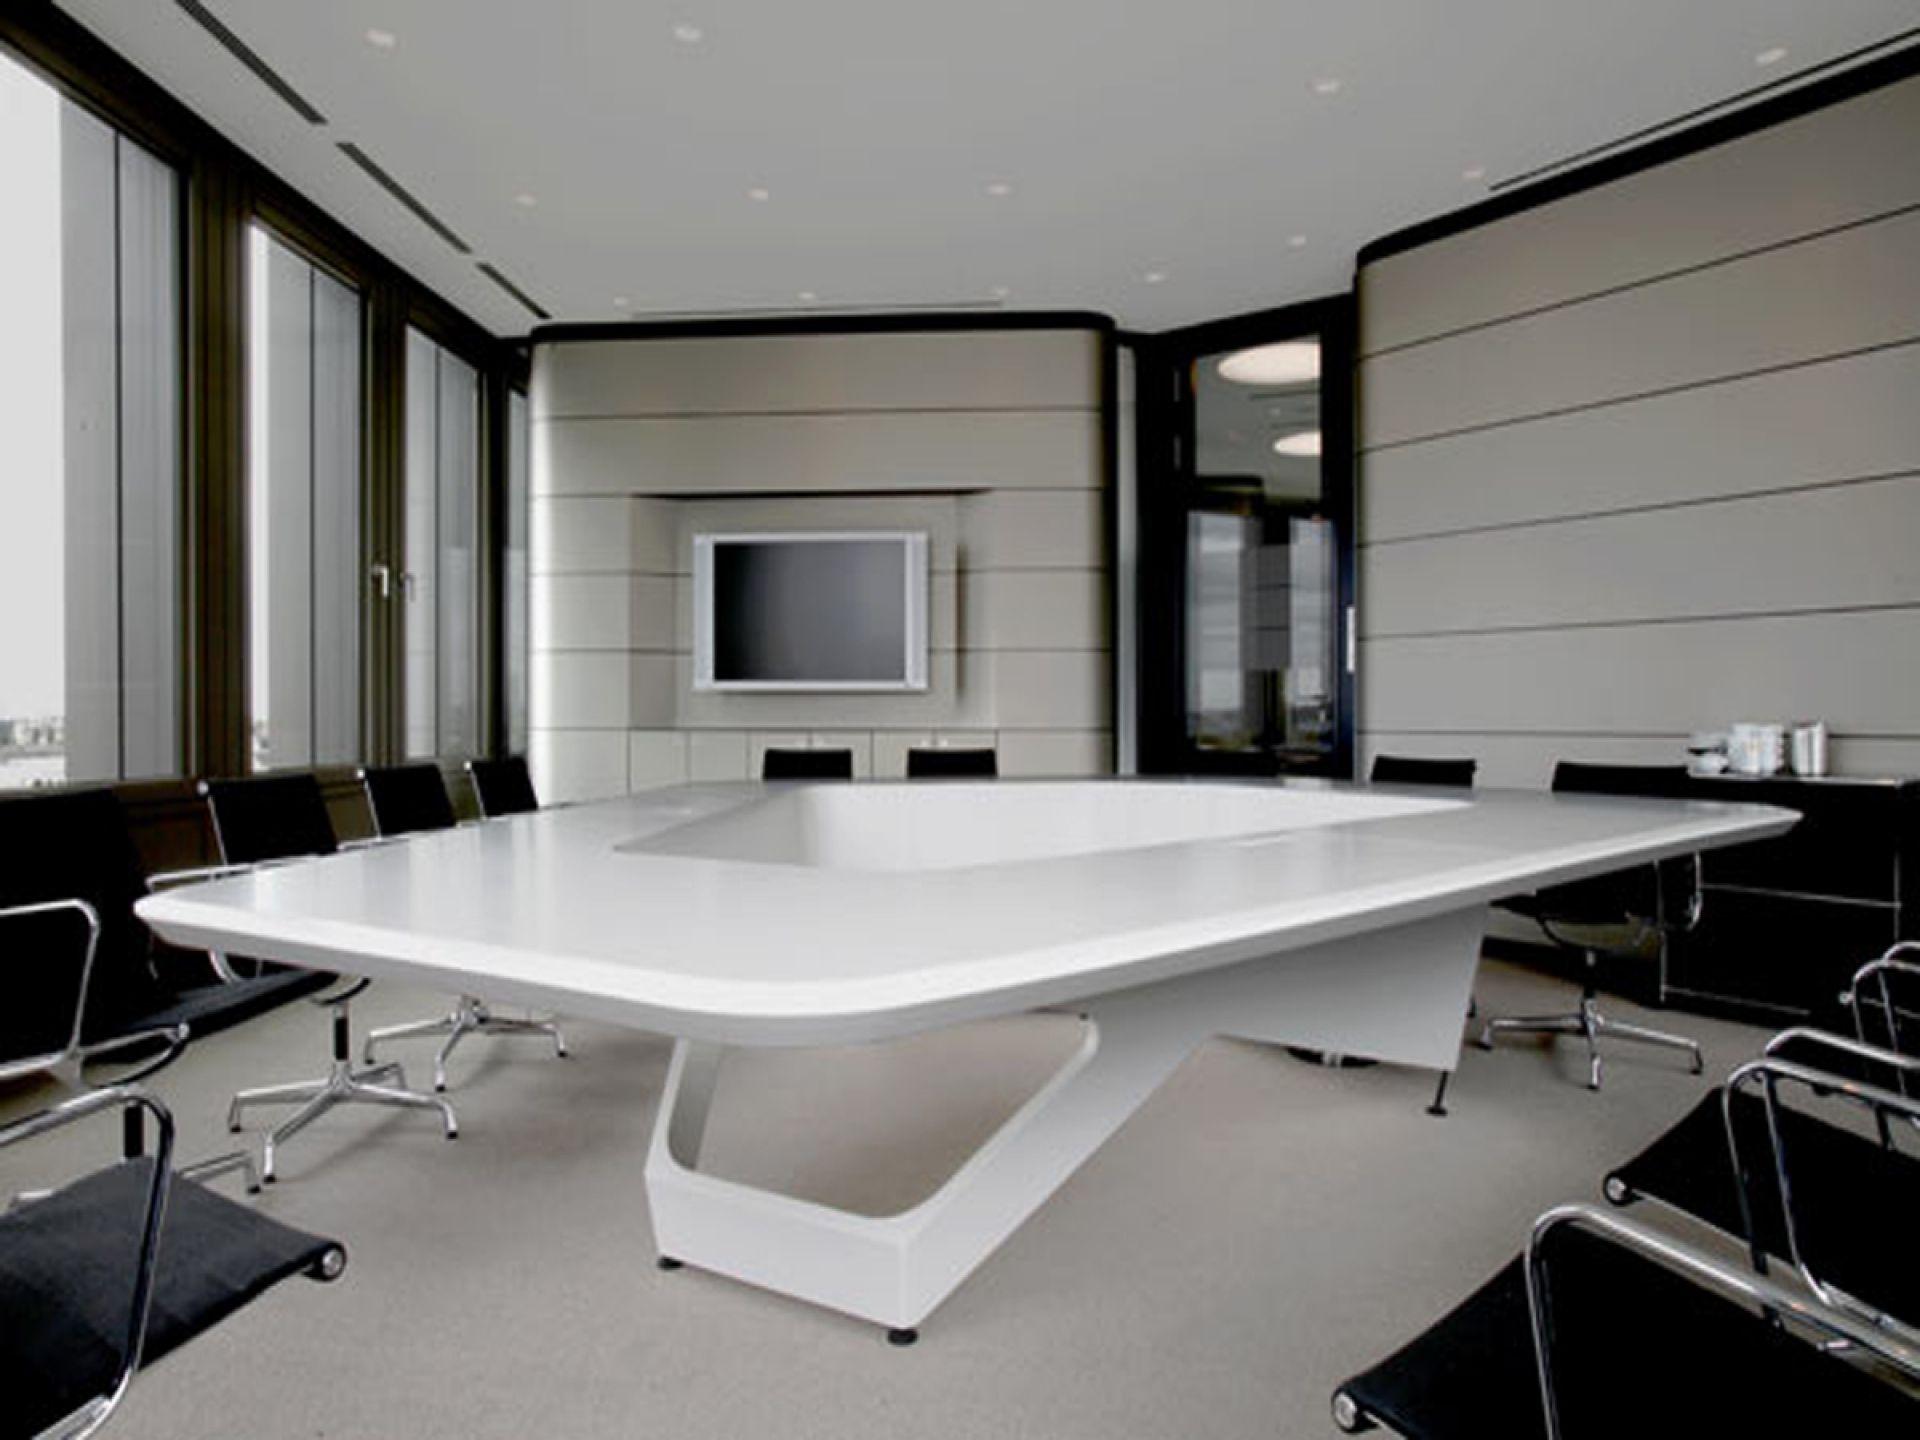 Image result for ultra modern office interior design | CA OFFICE MIN ...